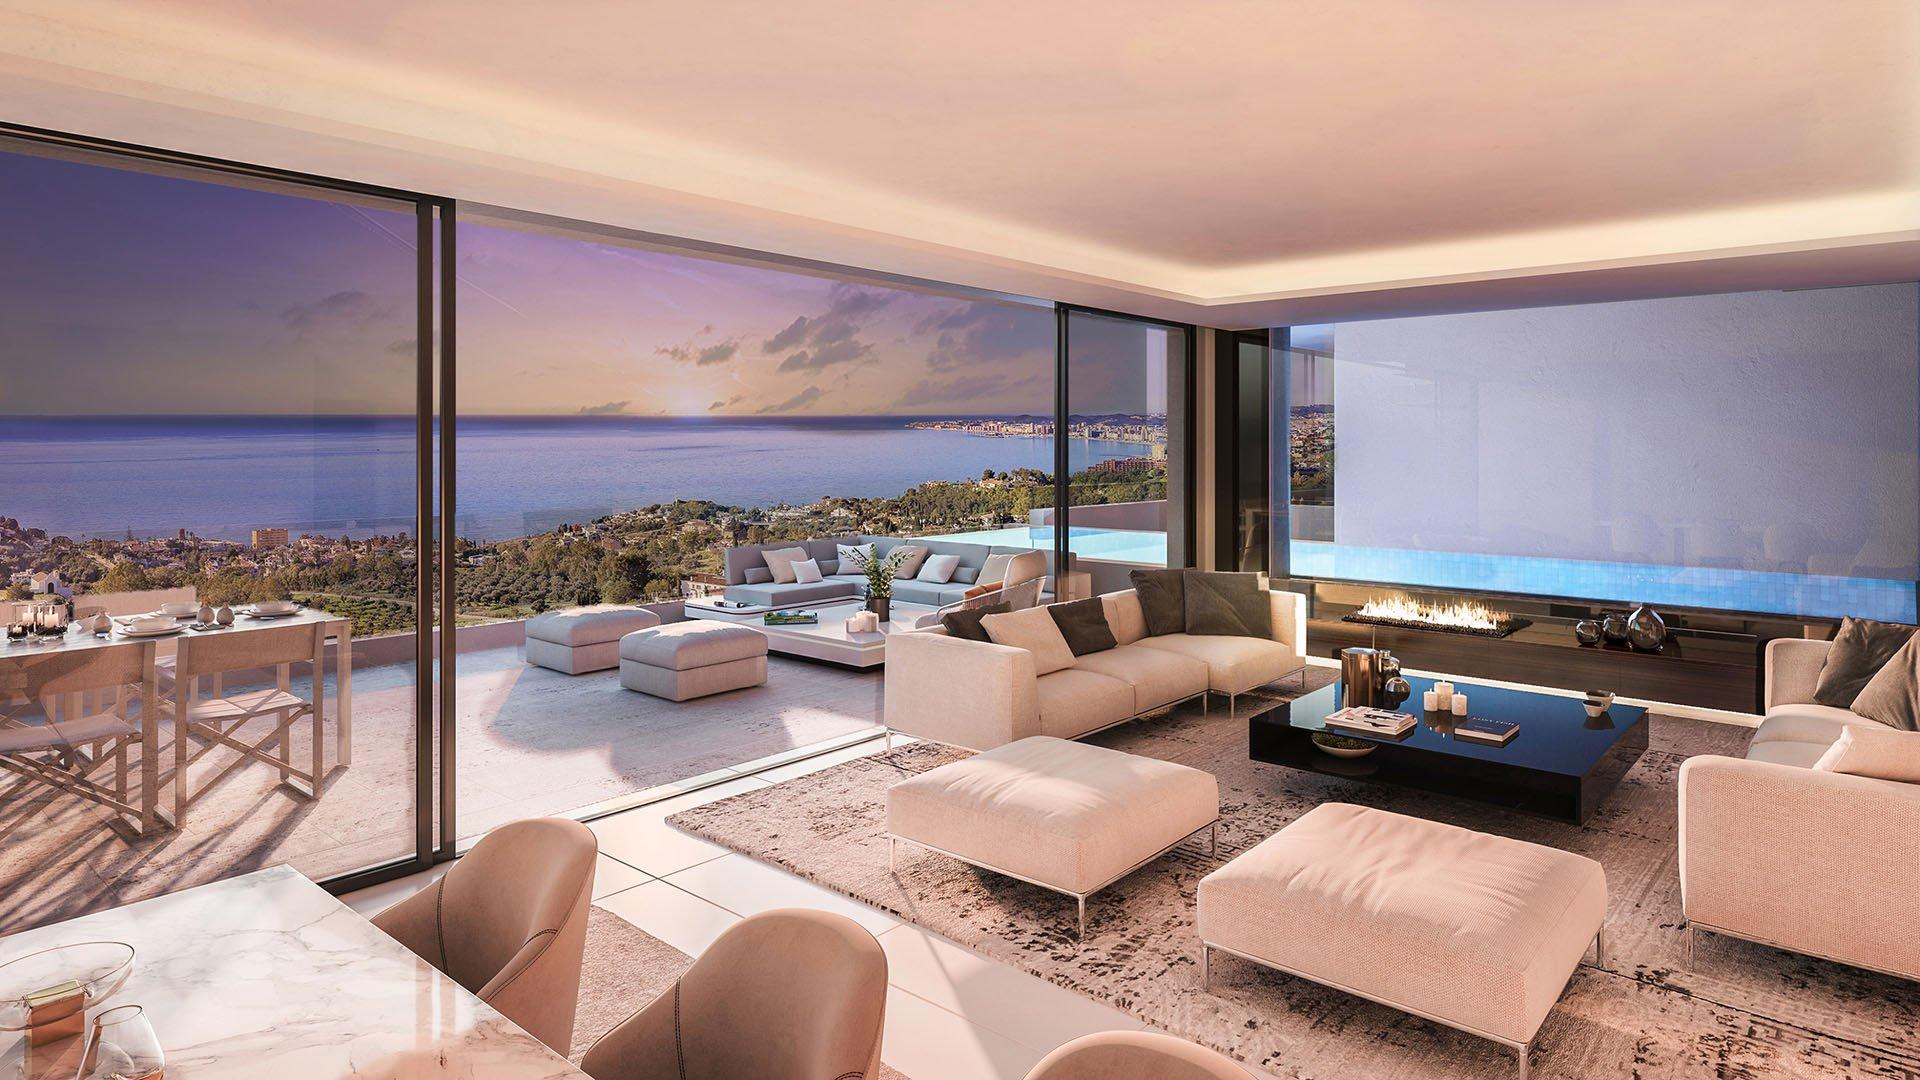 Marae: Exclusieve moderne villa in Benalmádena